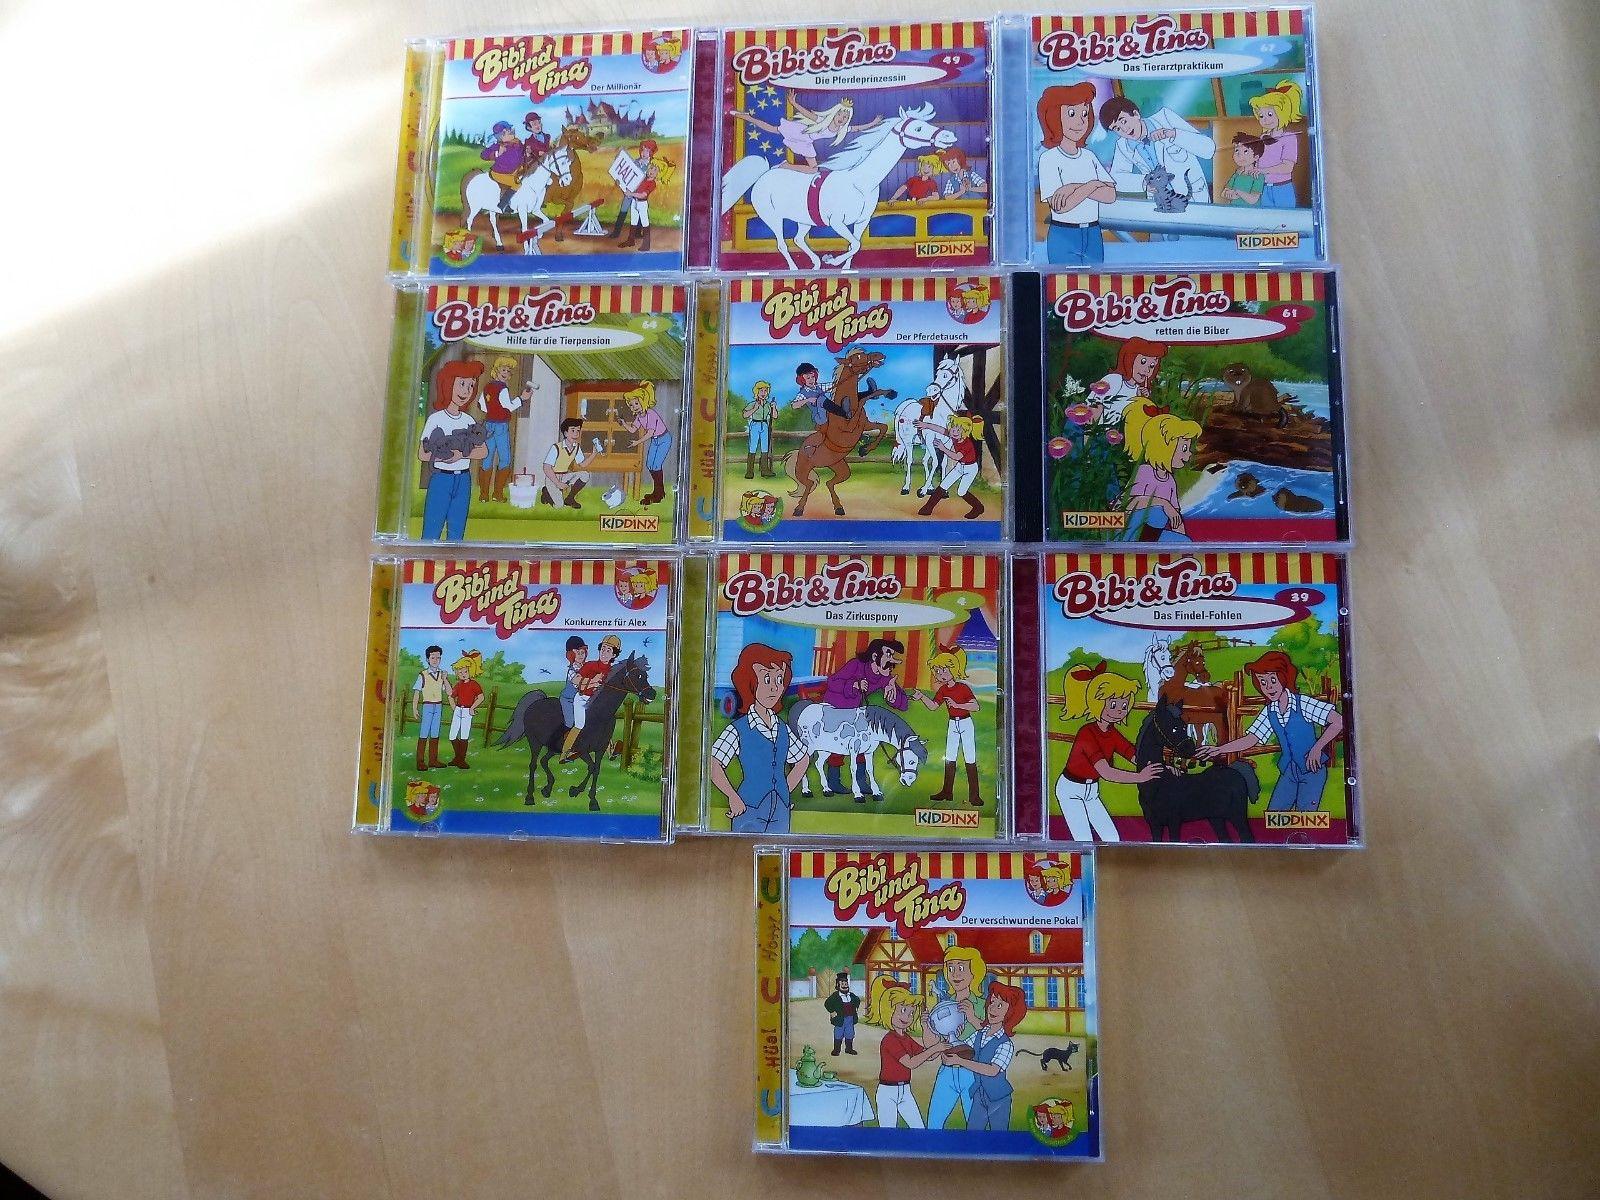 Bibi und Tina Sammlung10 CD's